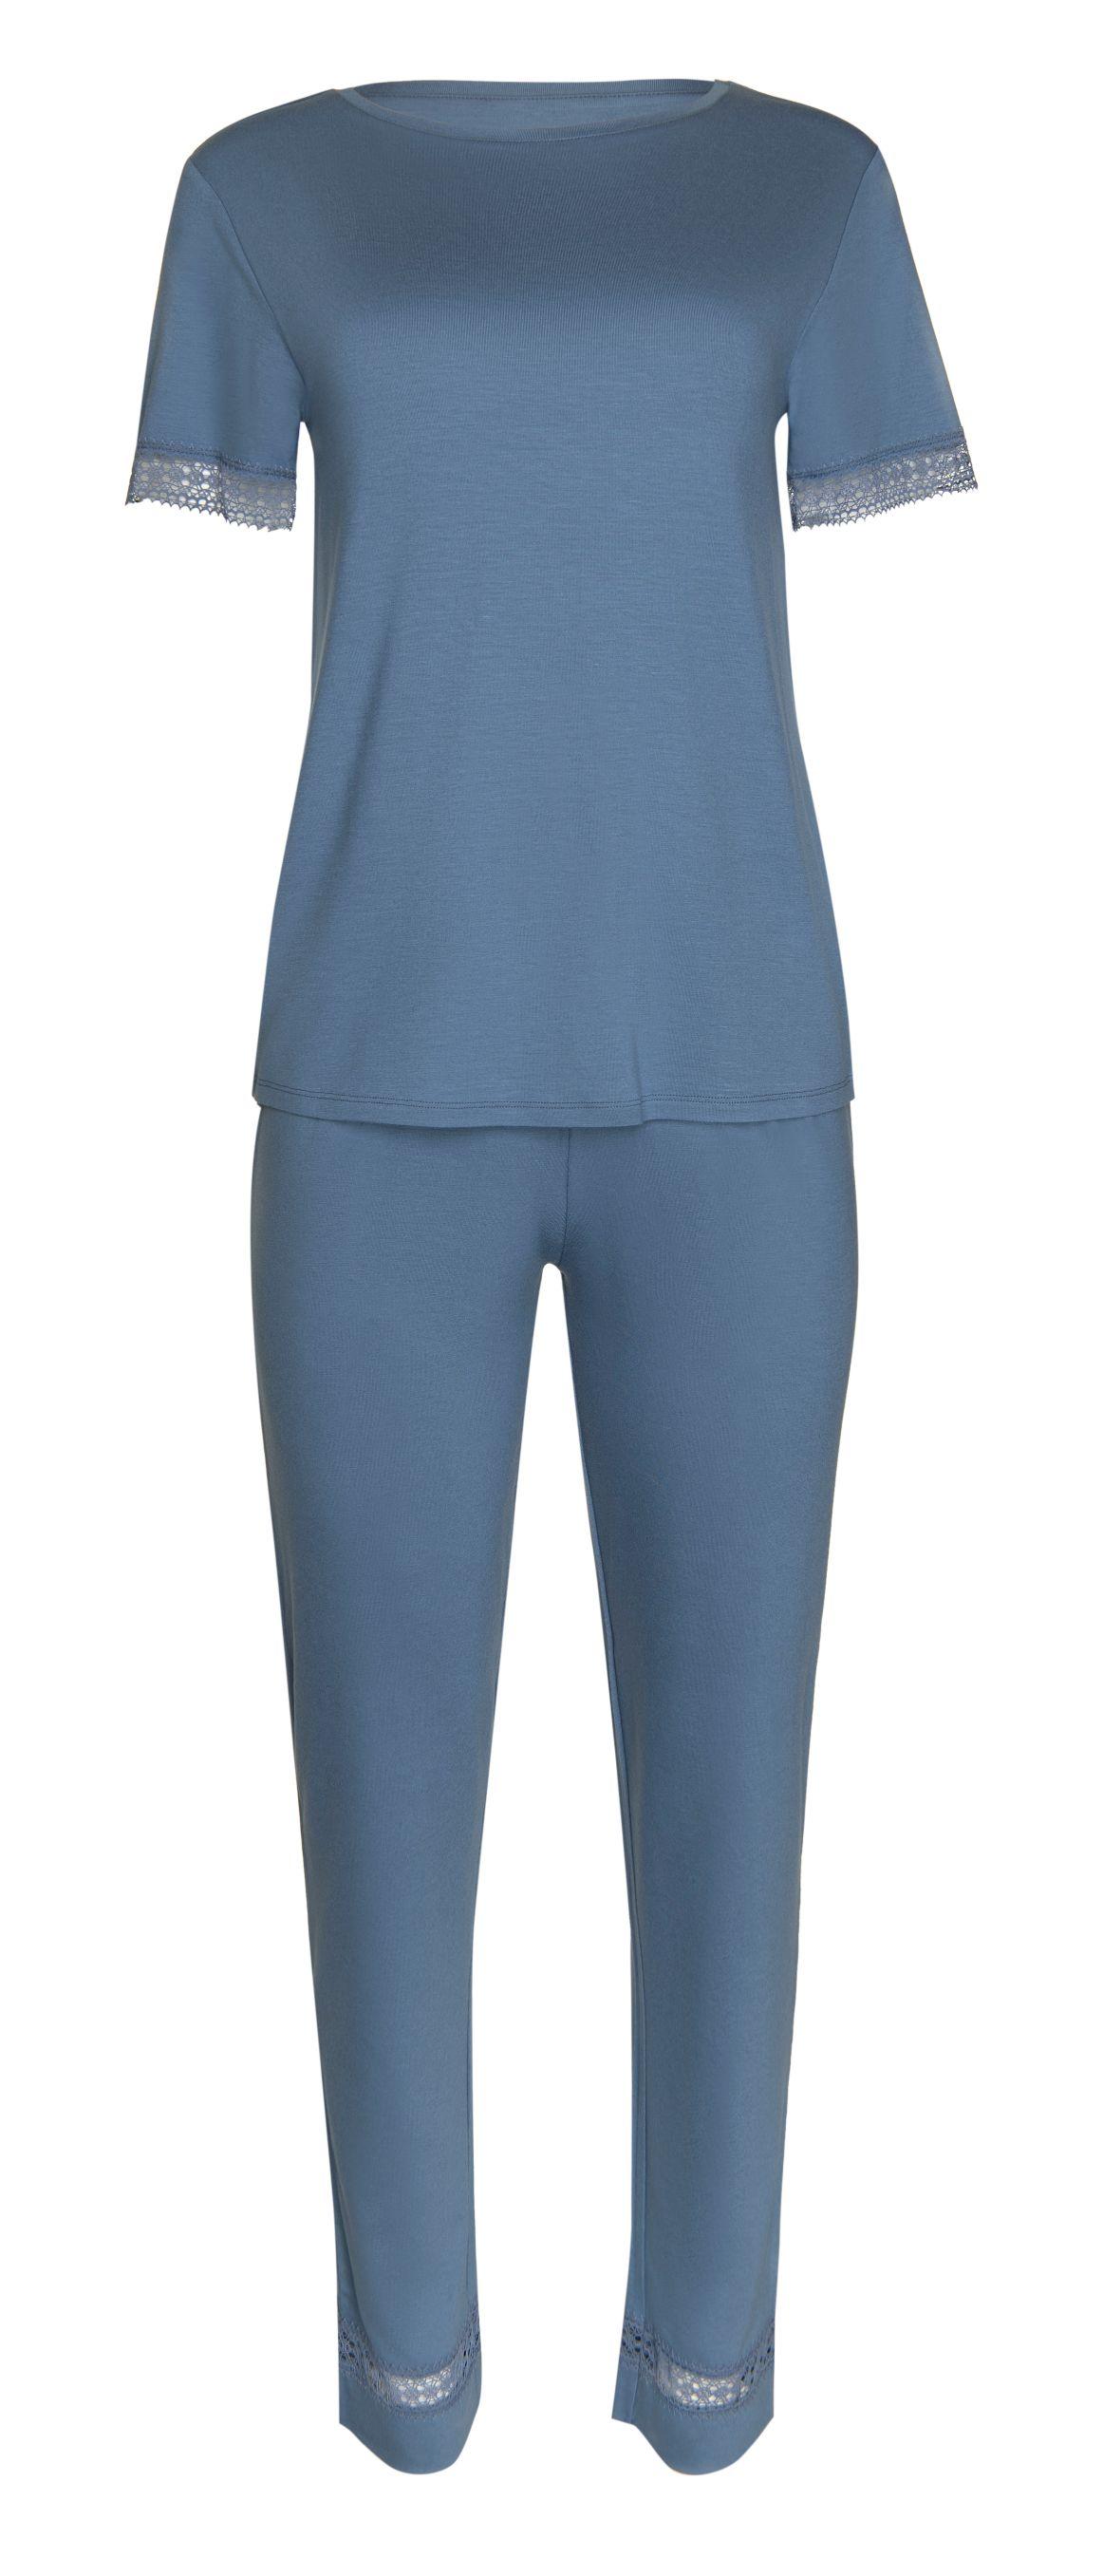 HELEN - Pyjama 23309